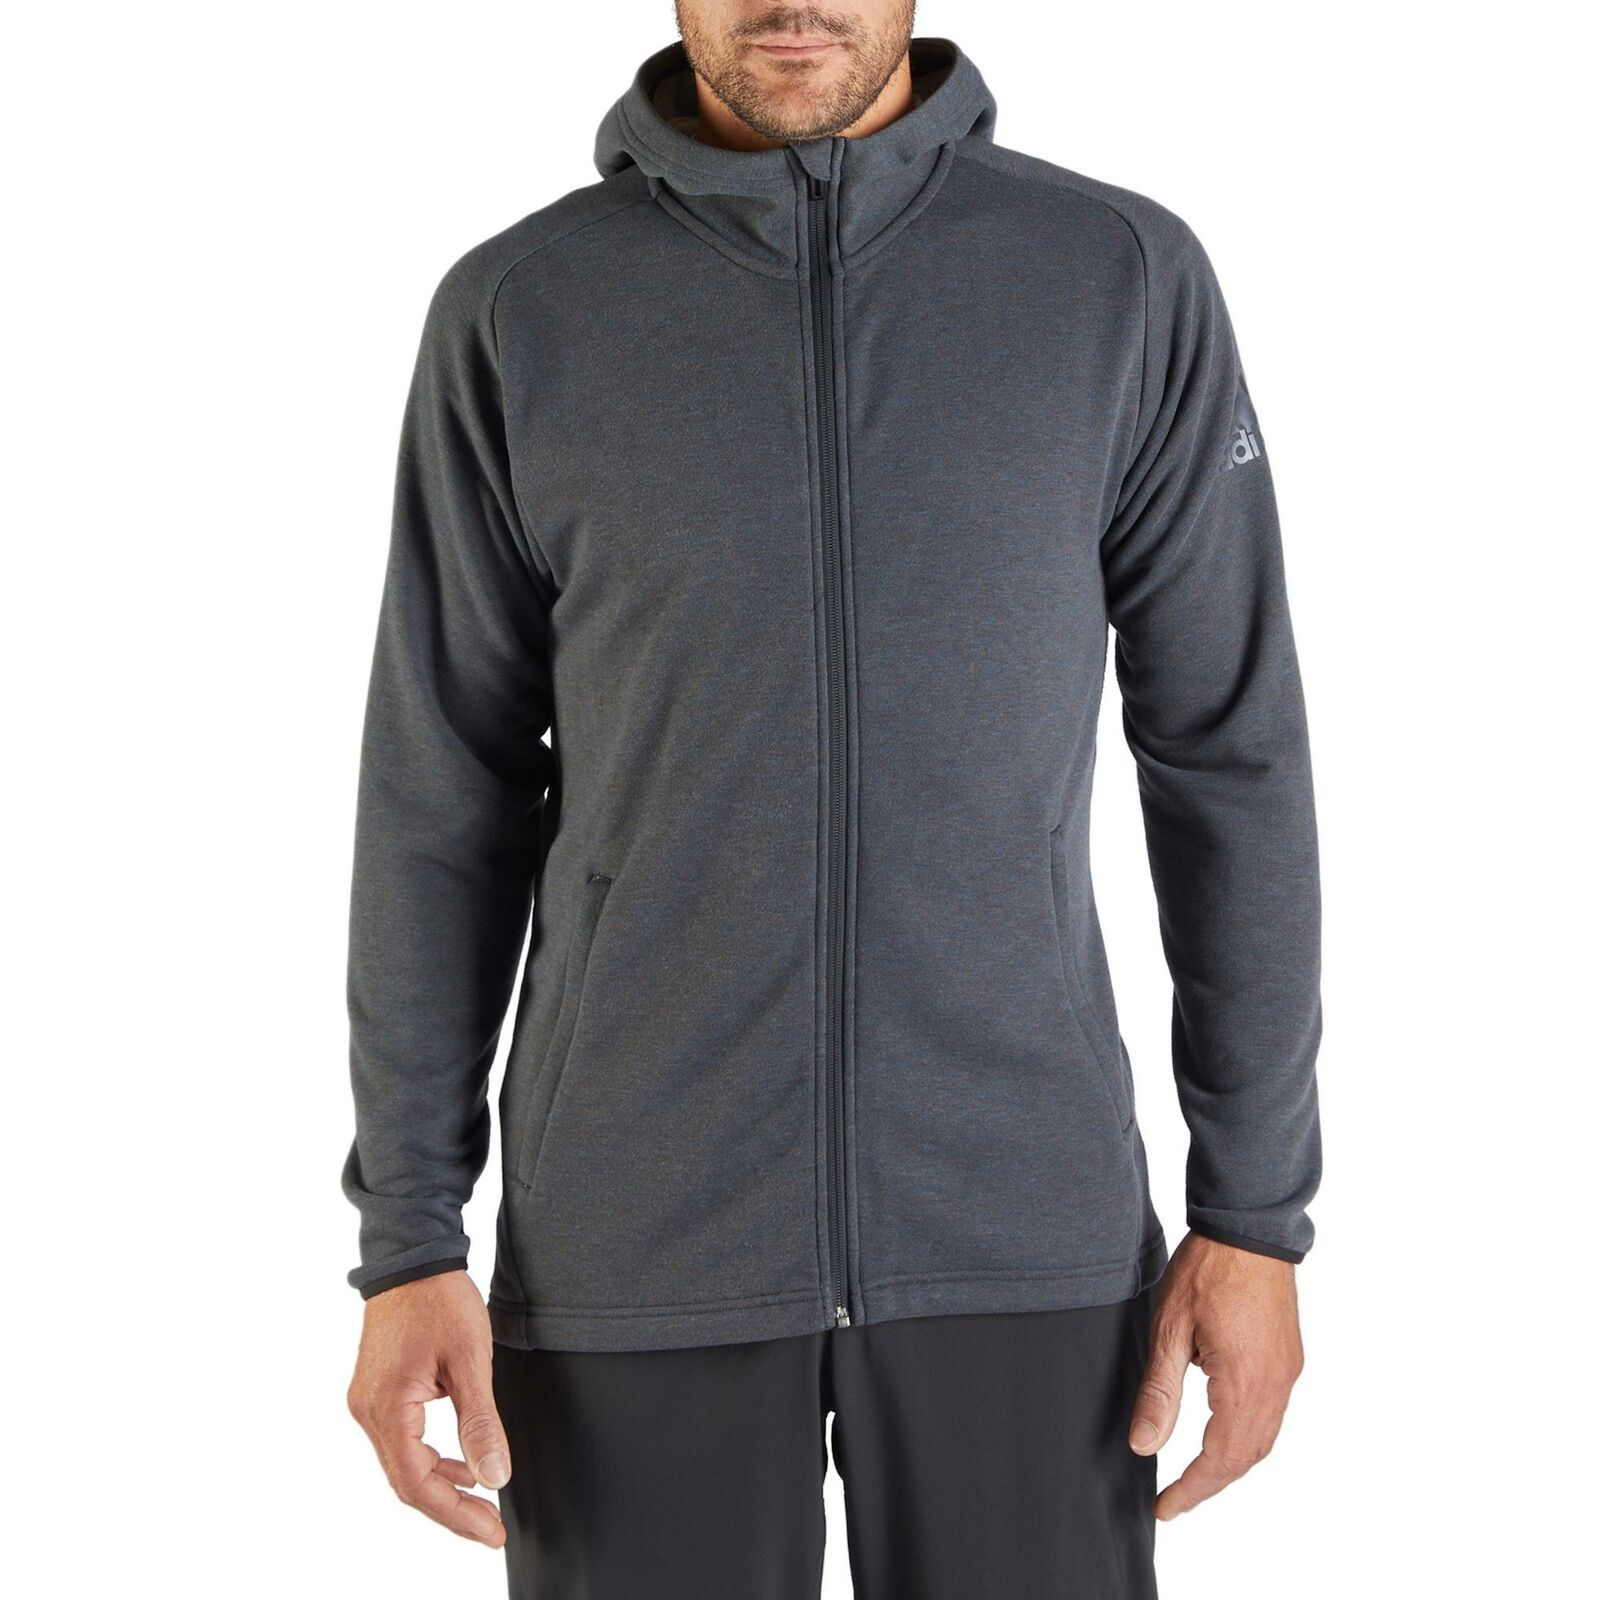 Adidas Herren Kapuzensweatjacke Sportjacke Jacke Oberbekleidung Sport Mode grau grau grau 9d686e